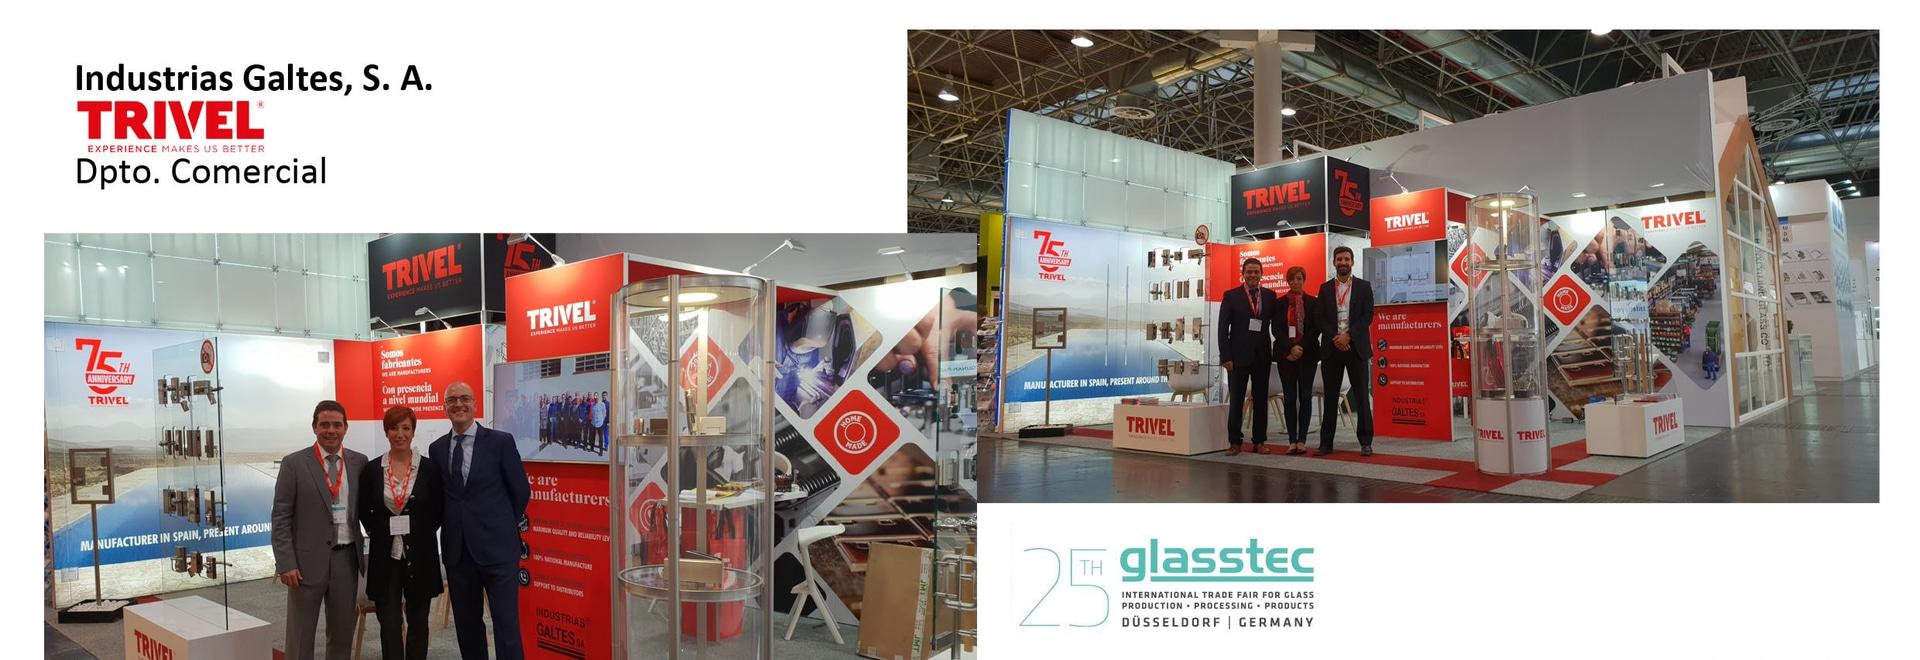 Trivel en Glasstec y Veteco 2018